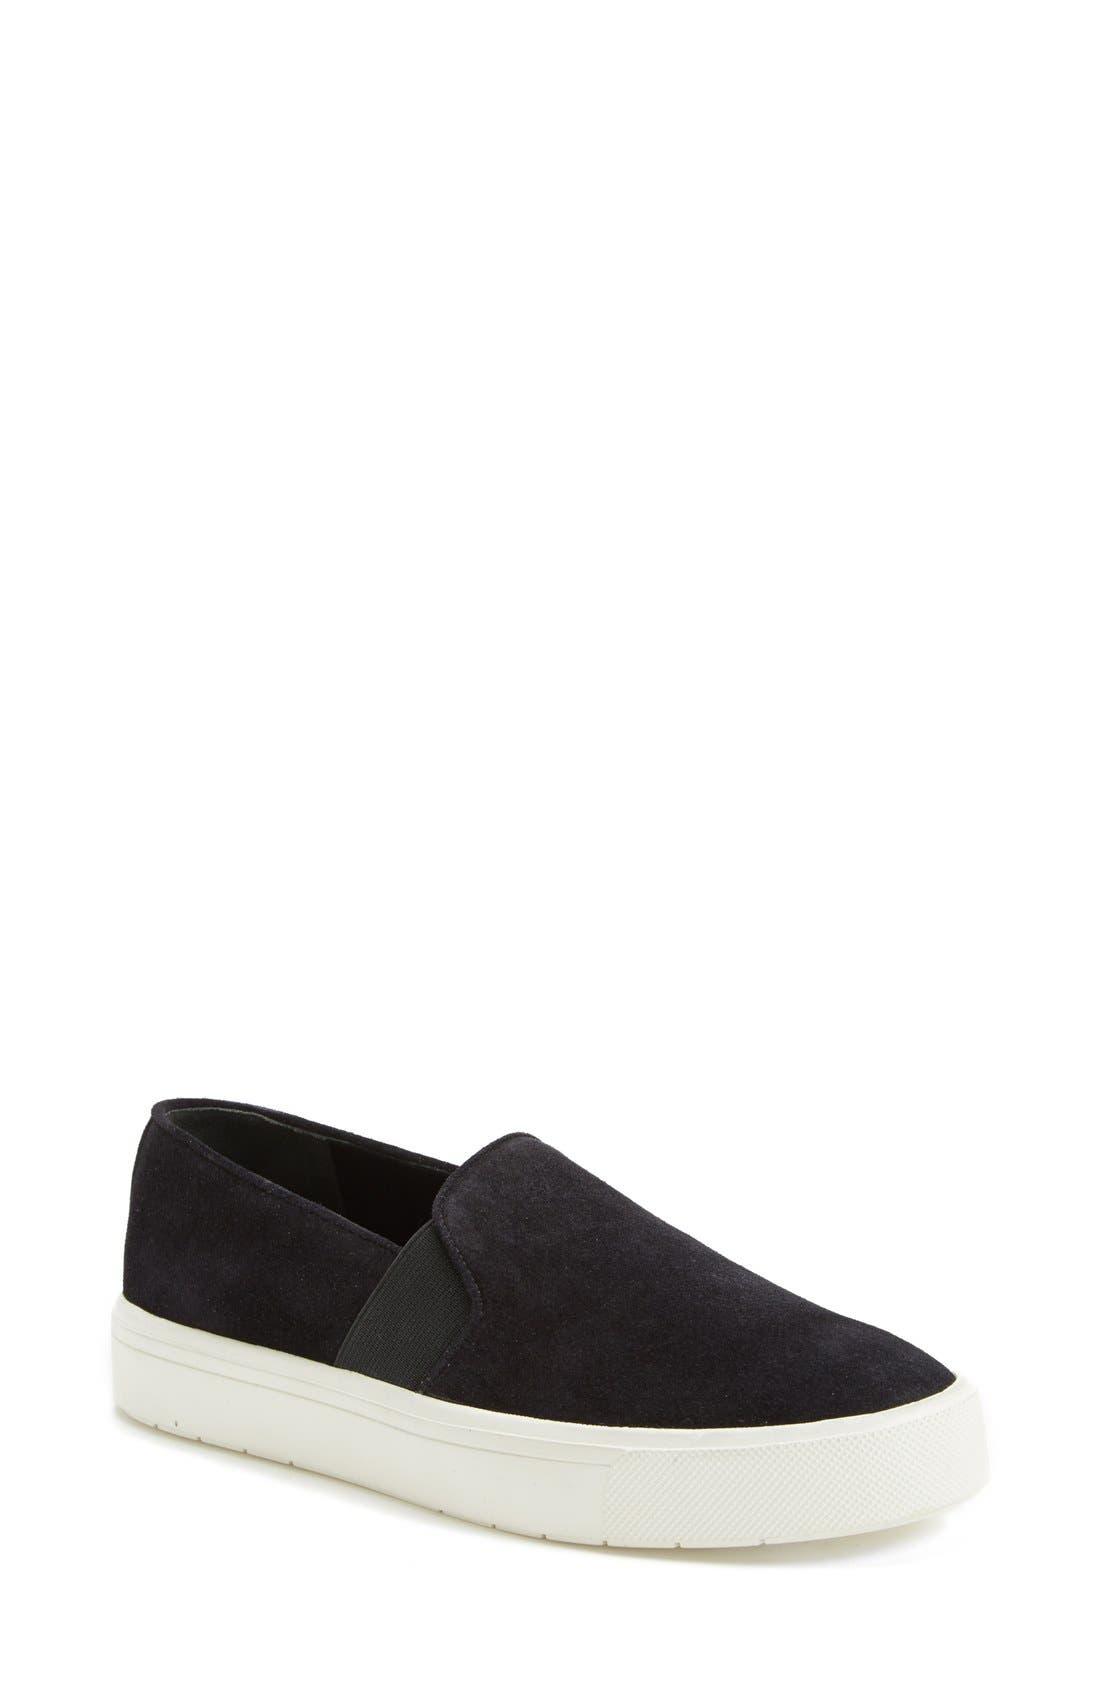 'Berlin 6' Slip-On Suede Sneaker, Main, color, 001